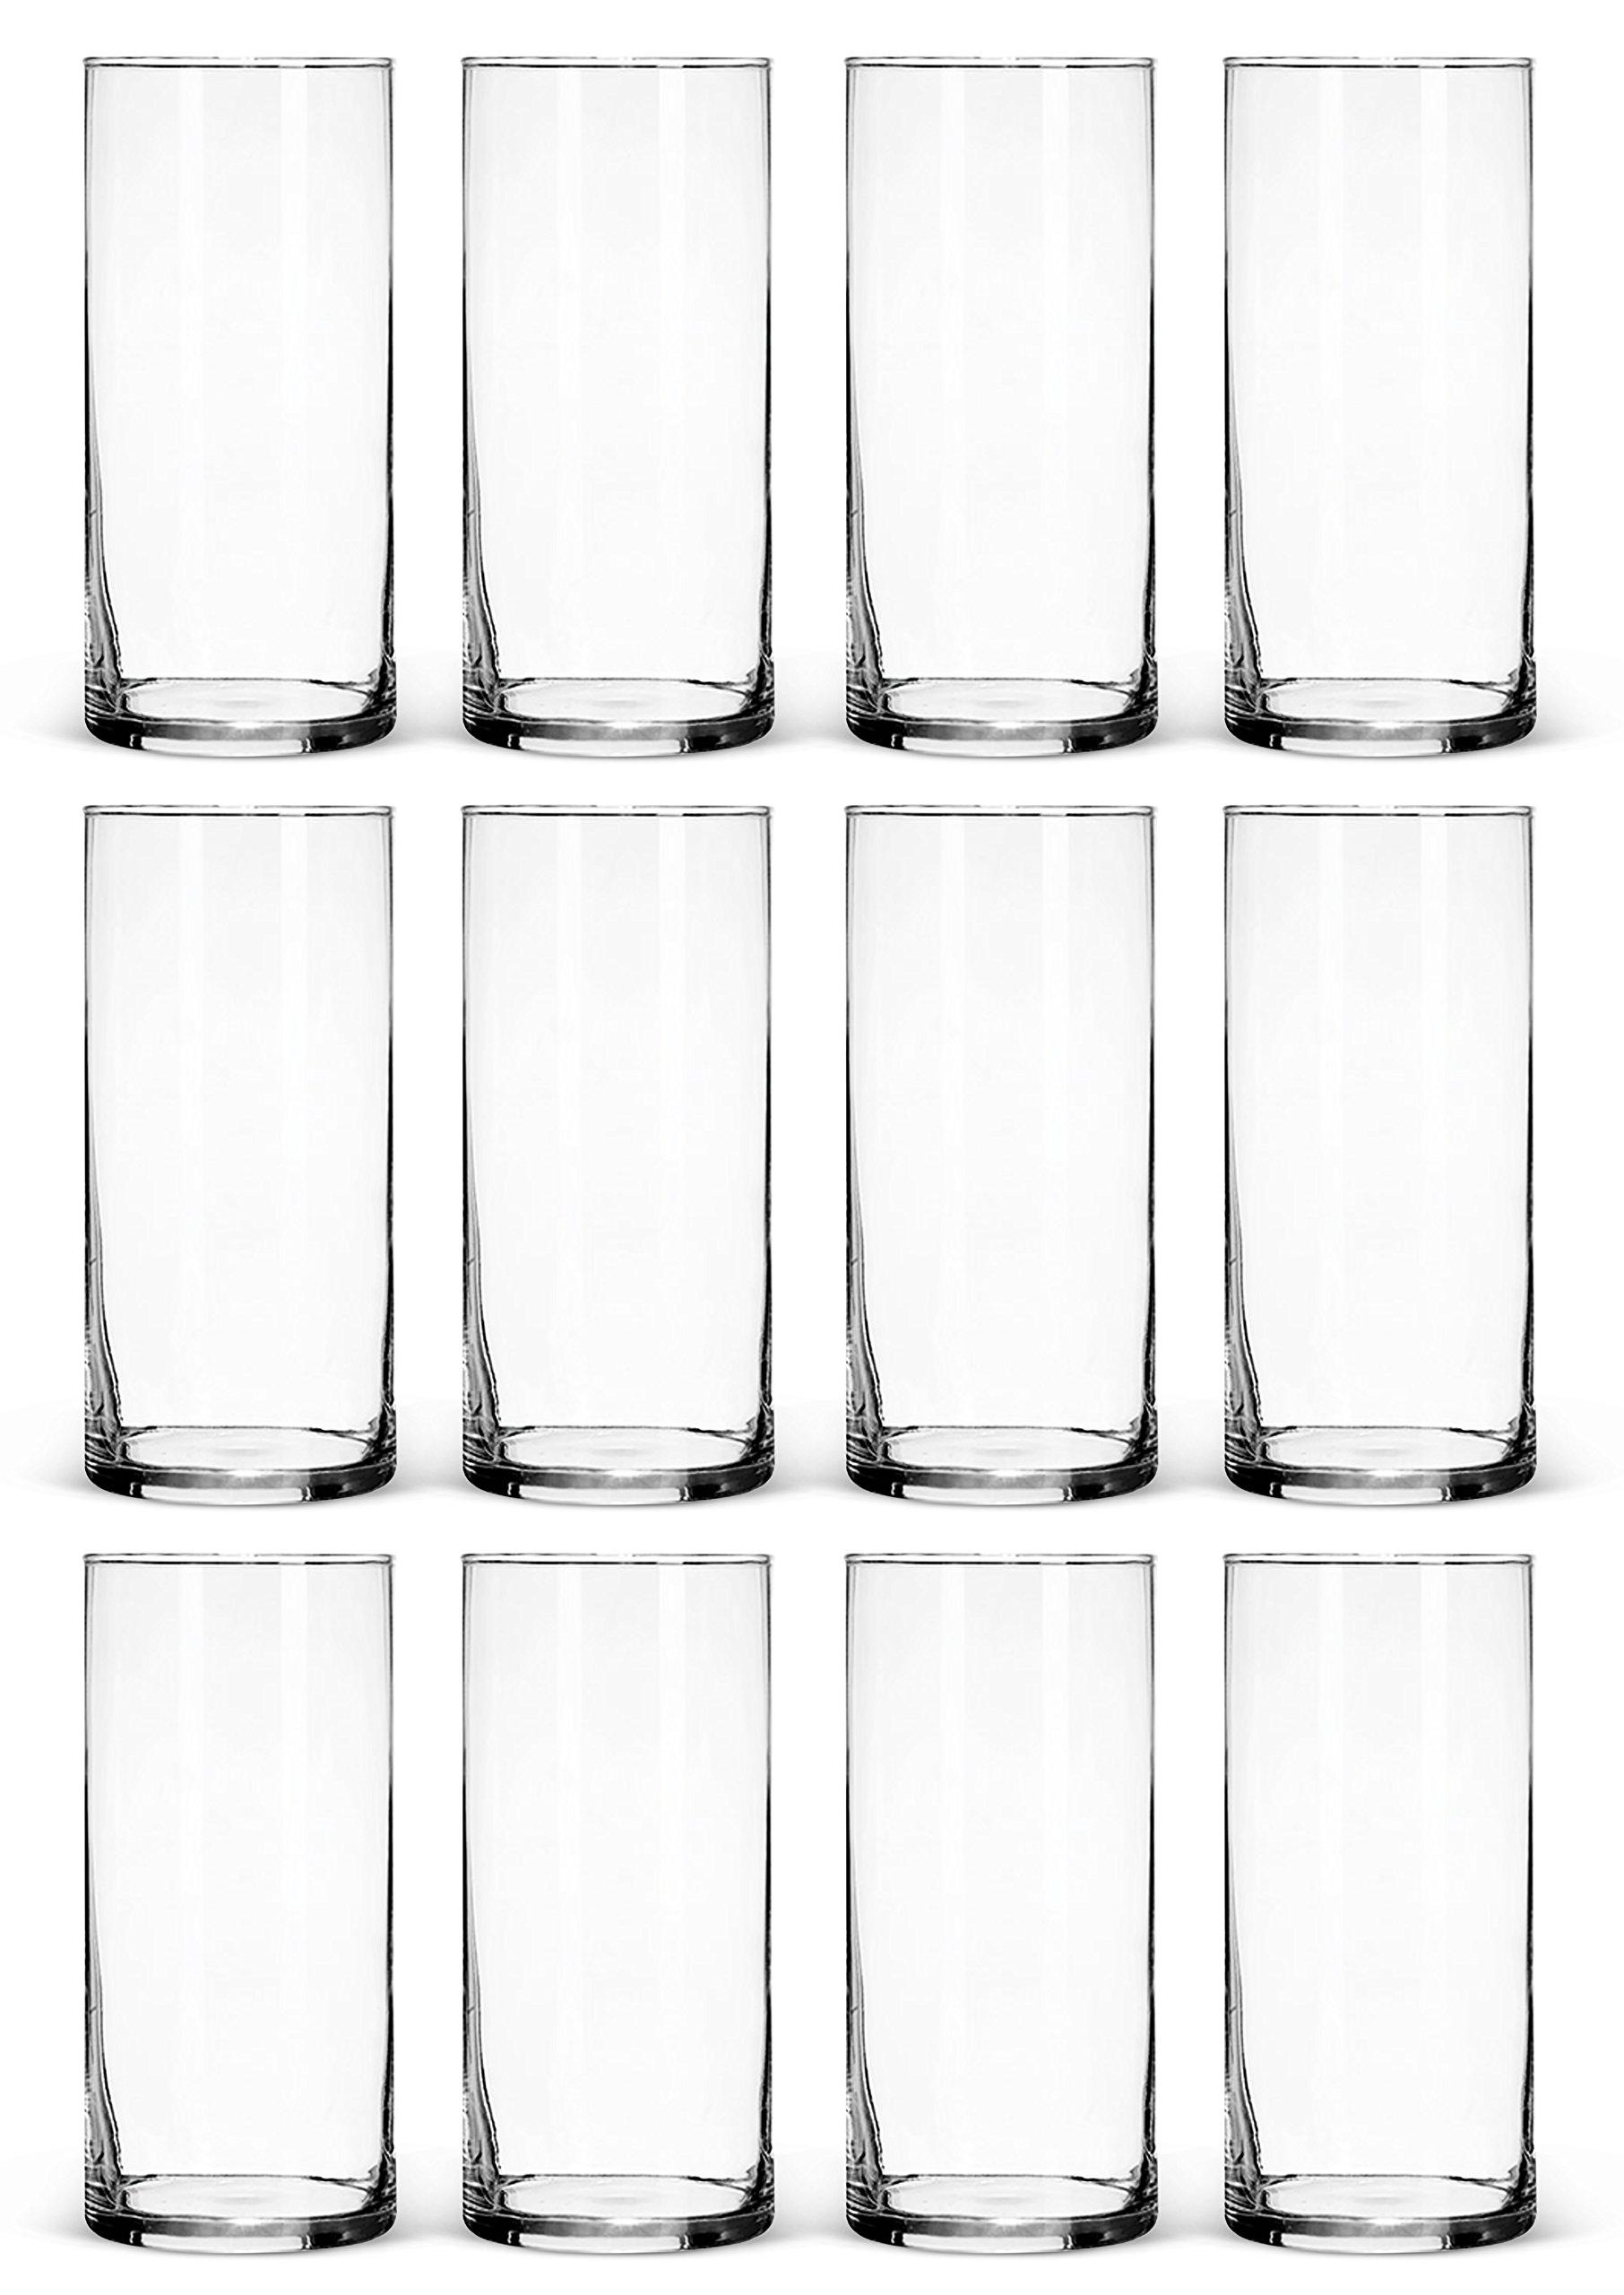 tall plastic vases amazon com rh amazon com plastic vases for centerpieces wholesale inexpensive plastic vases for centerpieces